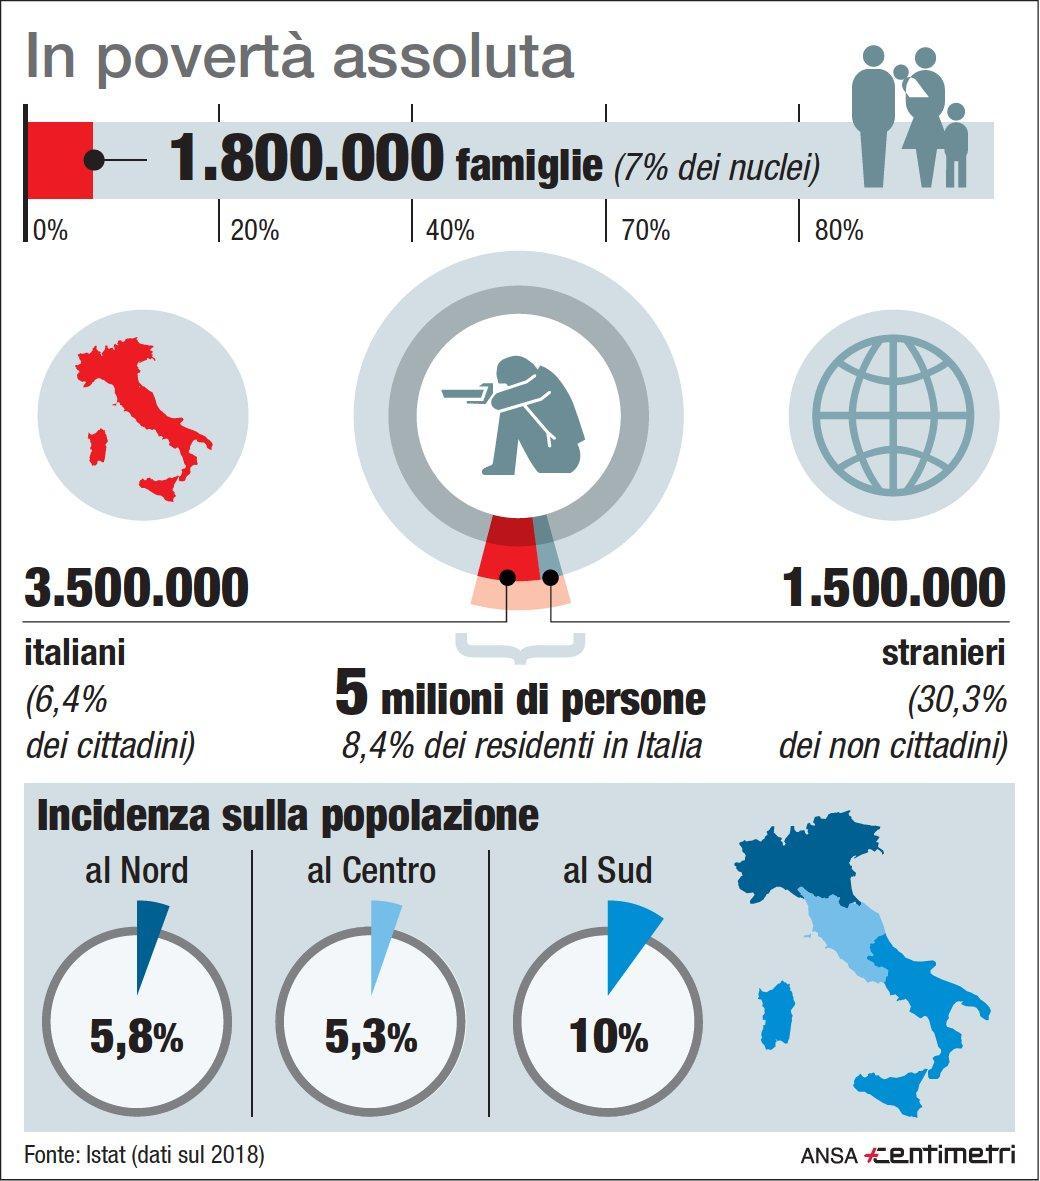 Povertà assoluta, ecco i numeri Istat